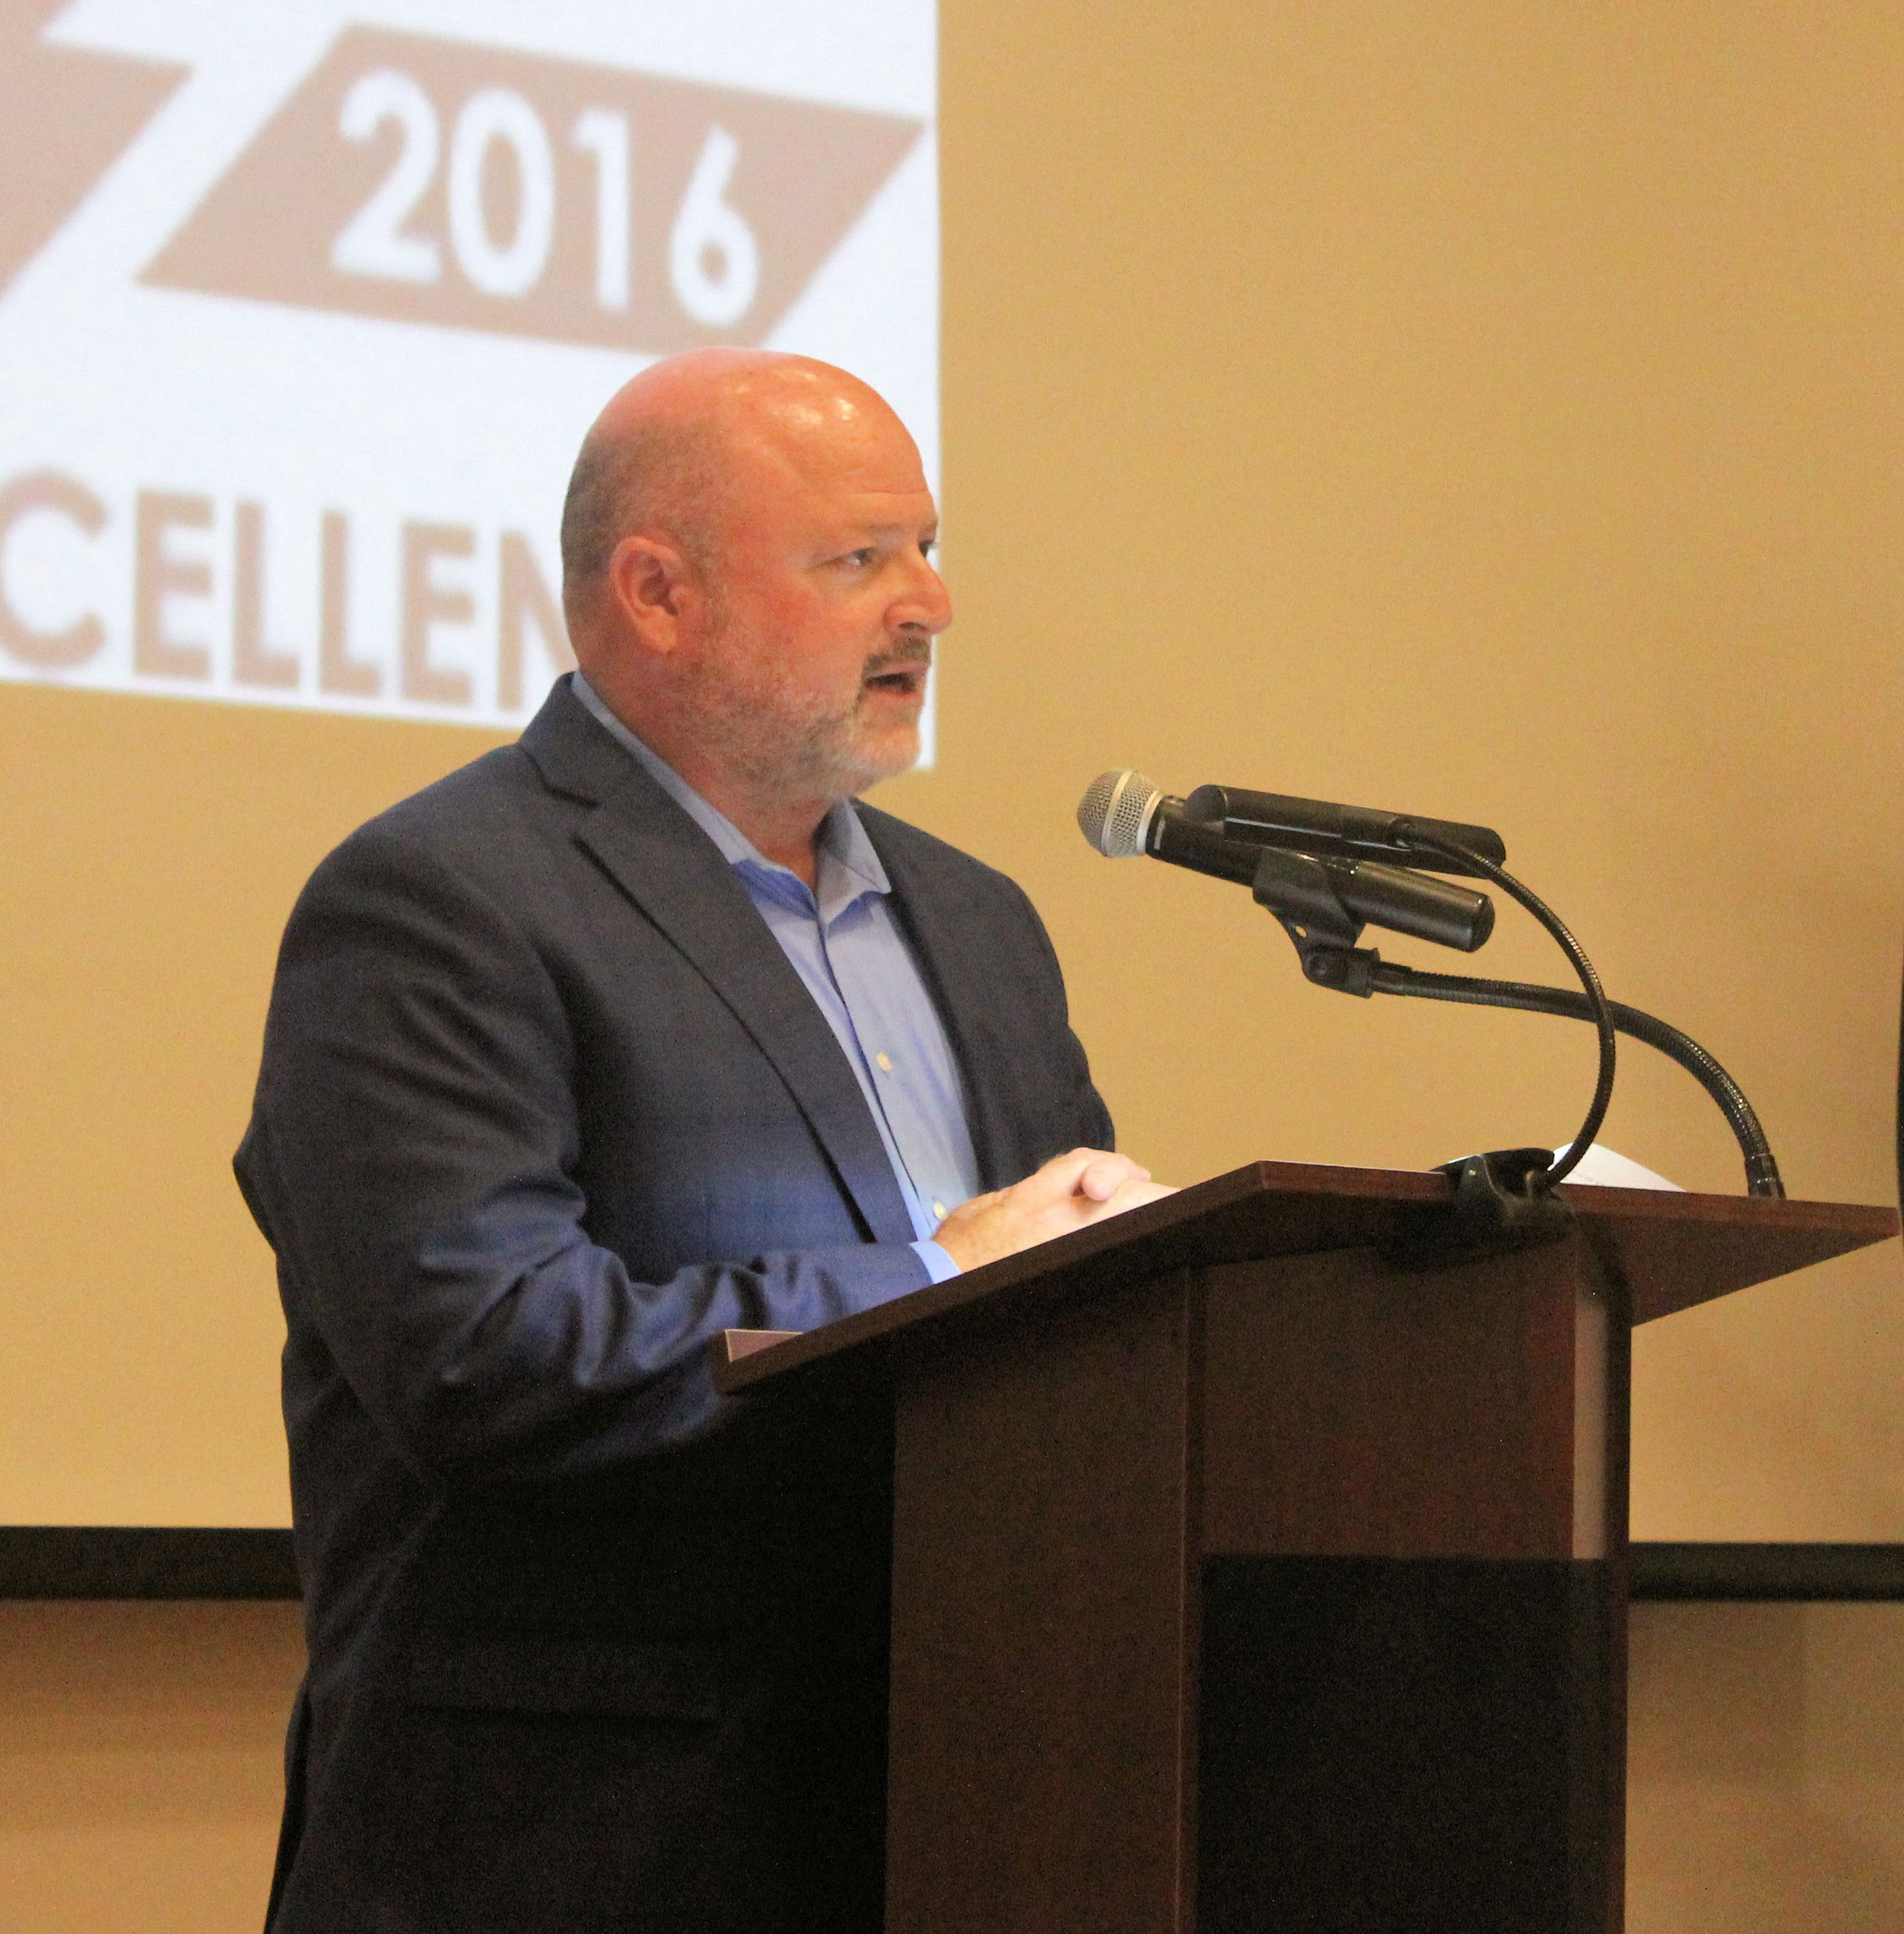 Stem School Wilmington Nc: Wilmington Business Development Annual Meeting Celebrates